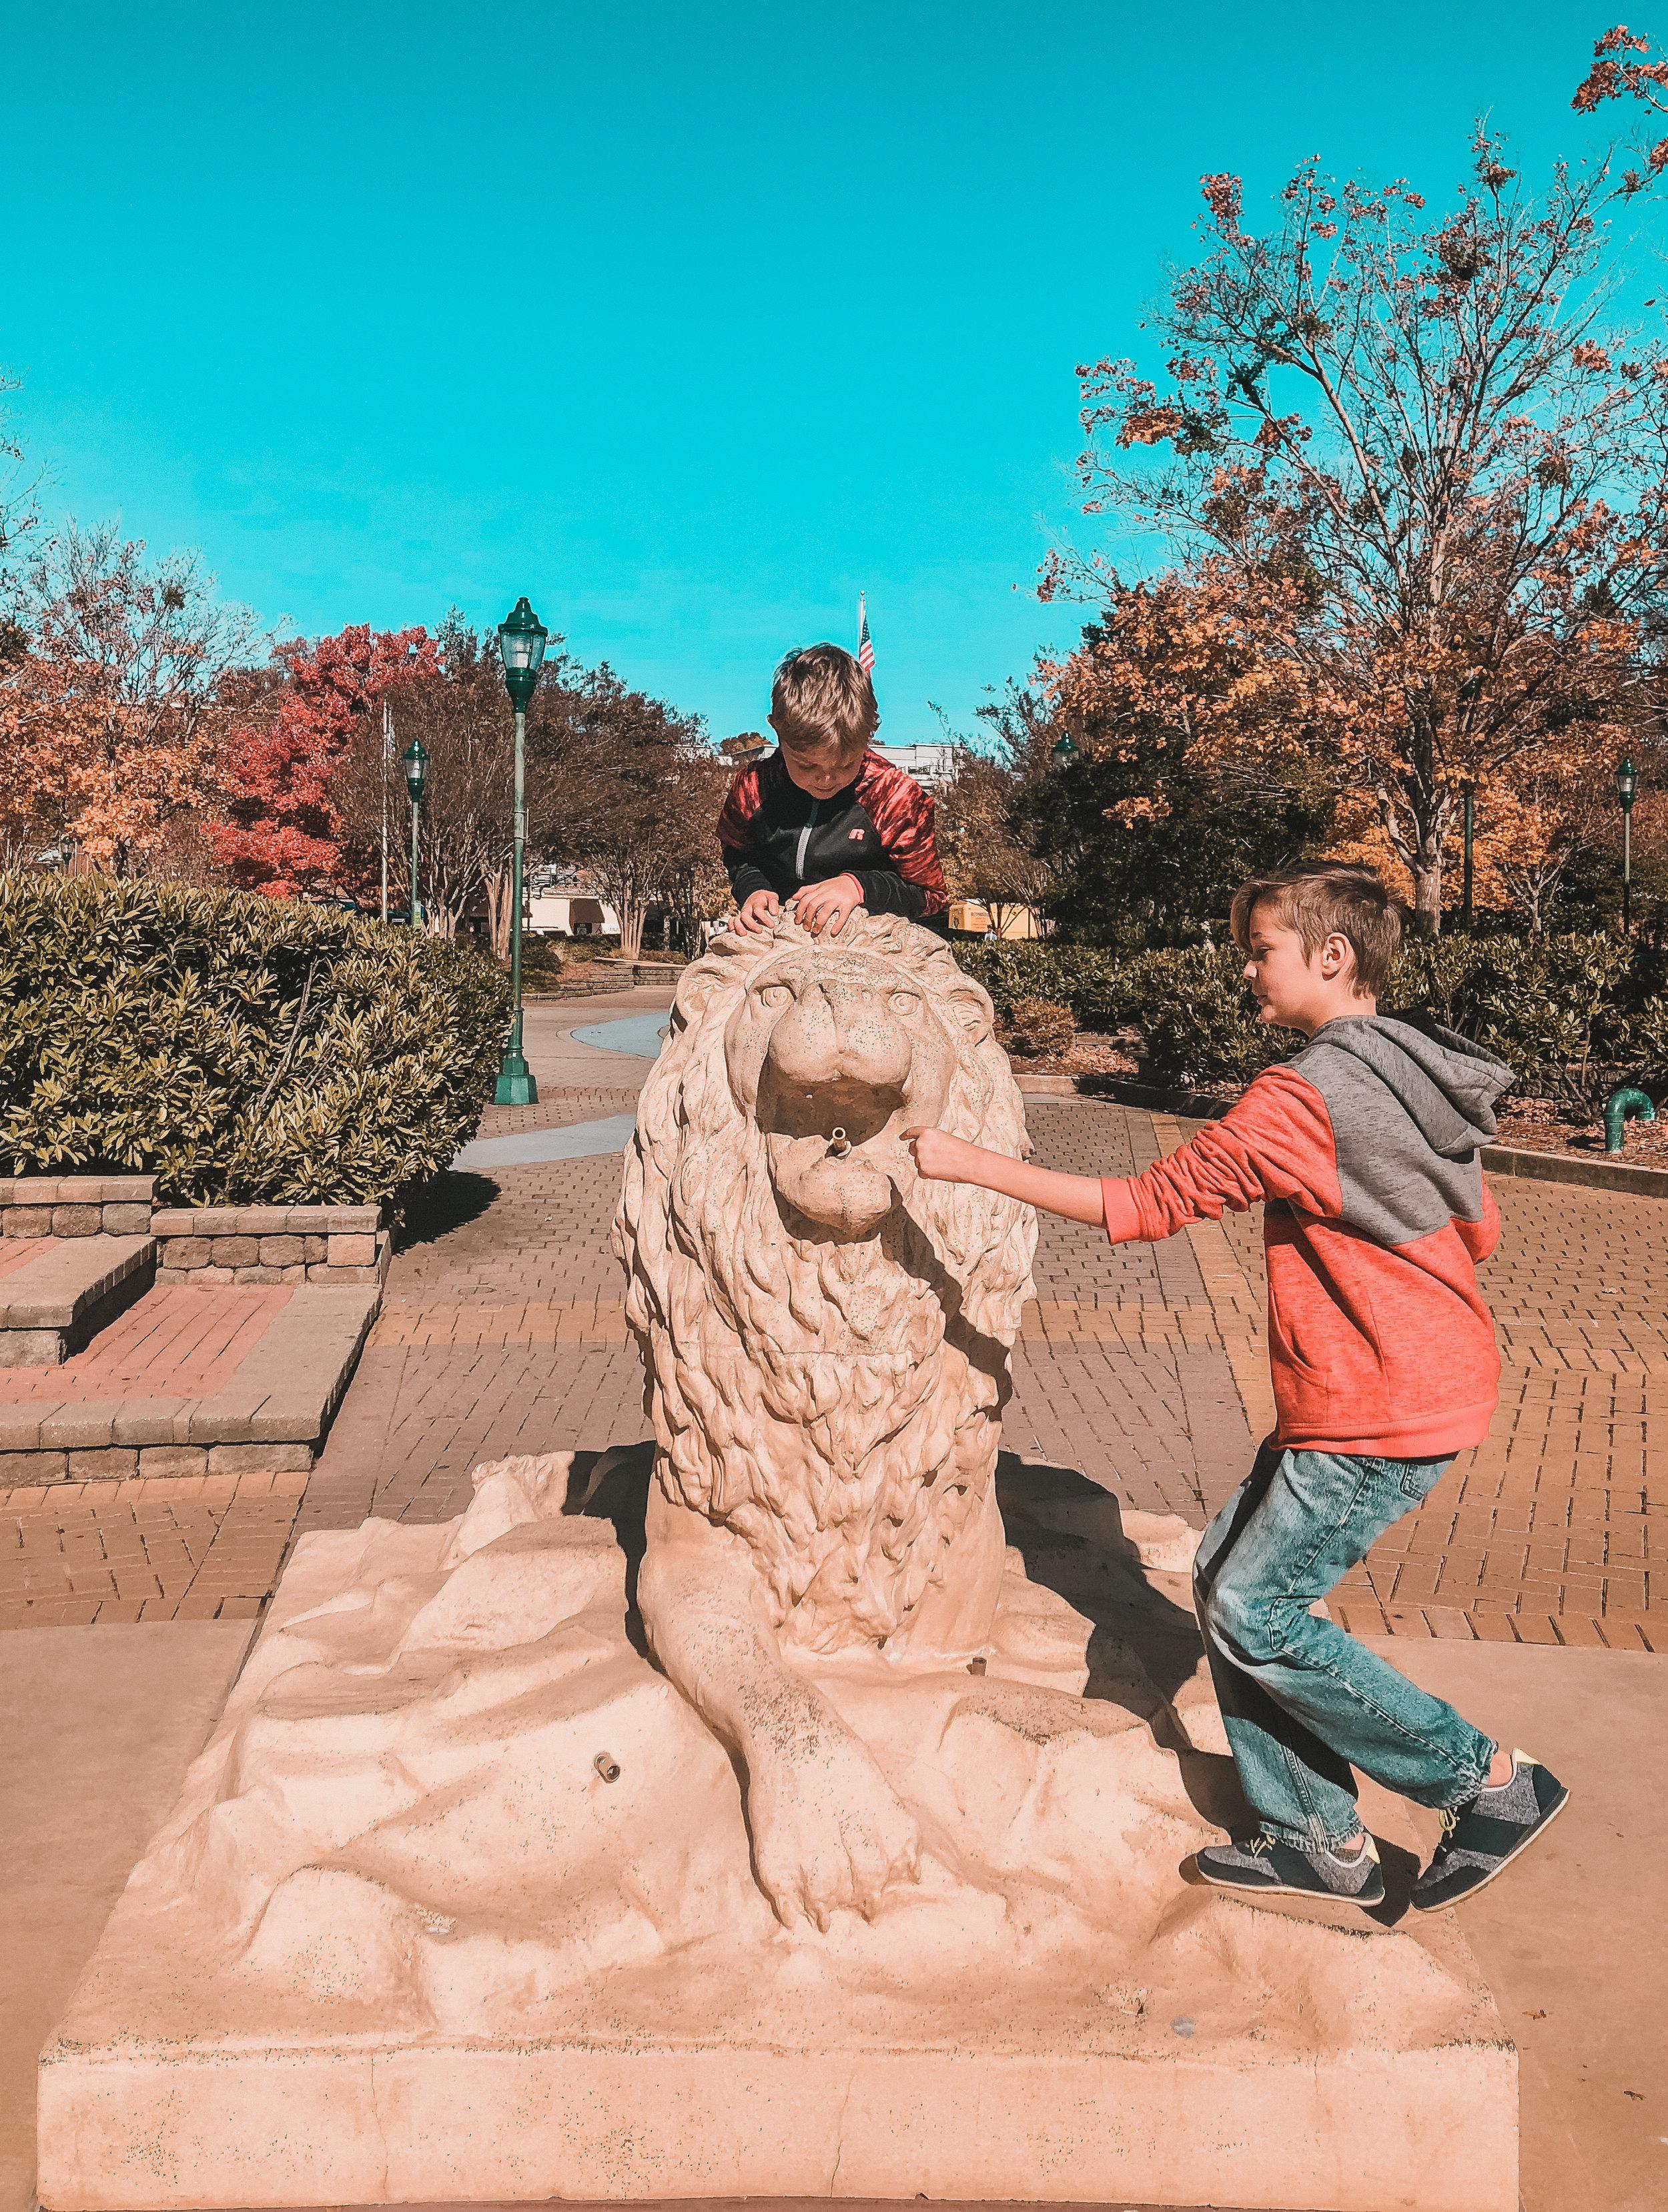 Coolidge Park, Chattanooga TN